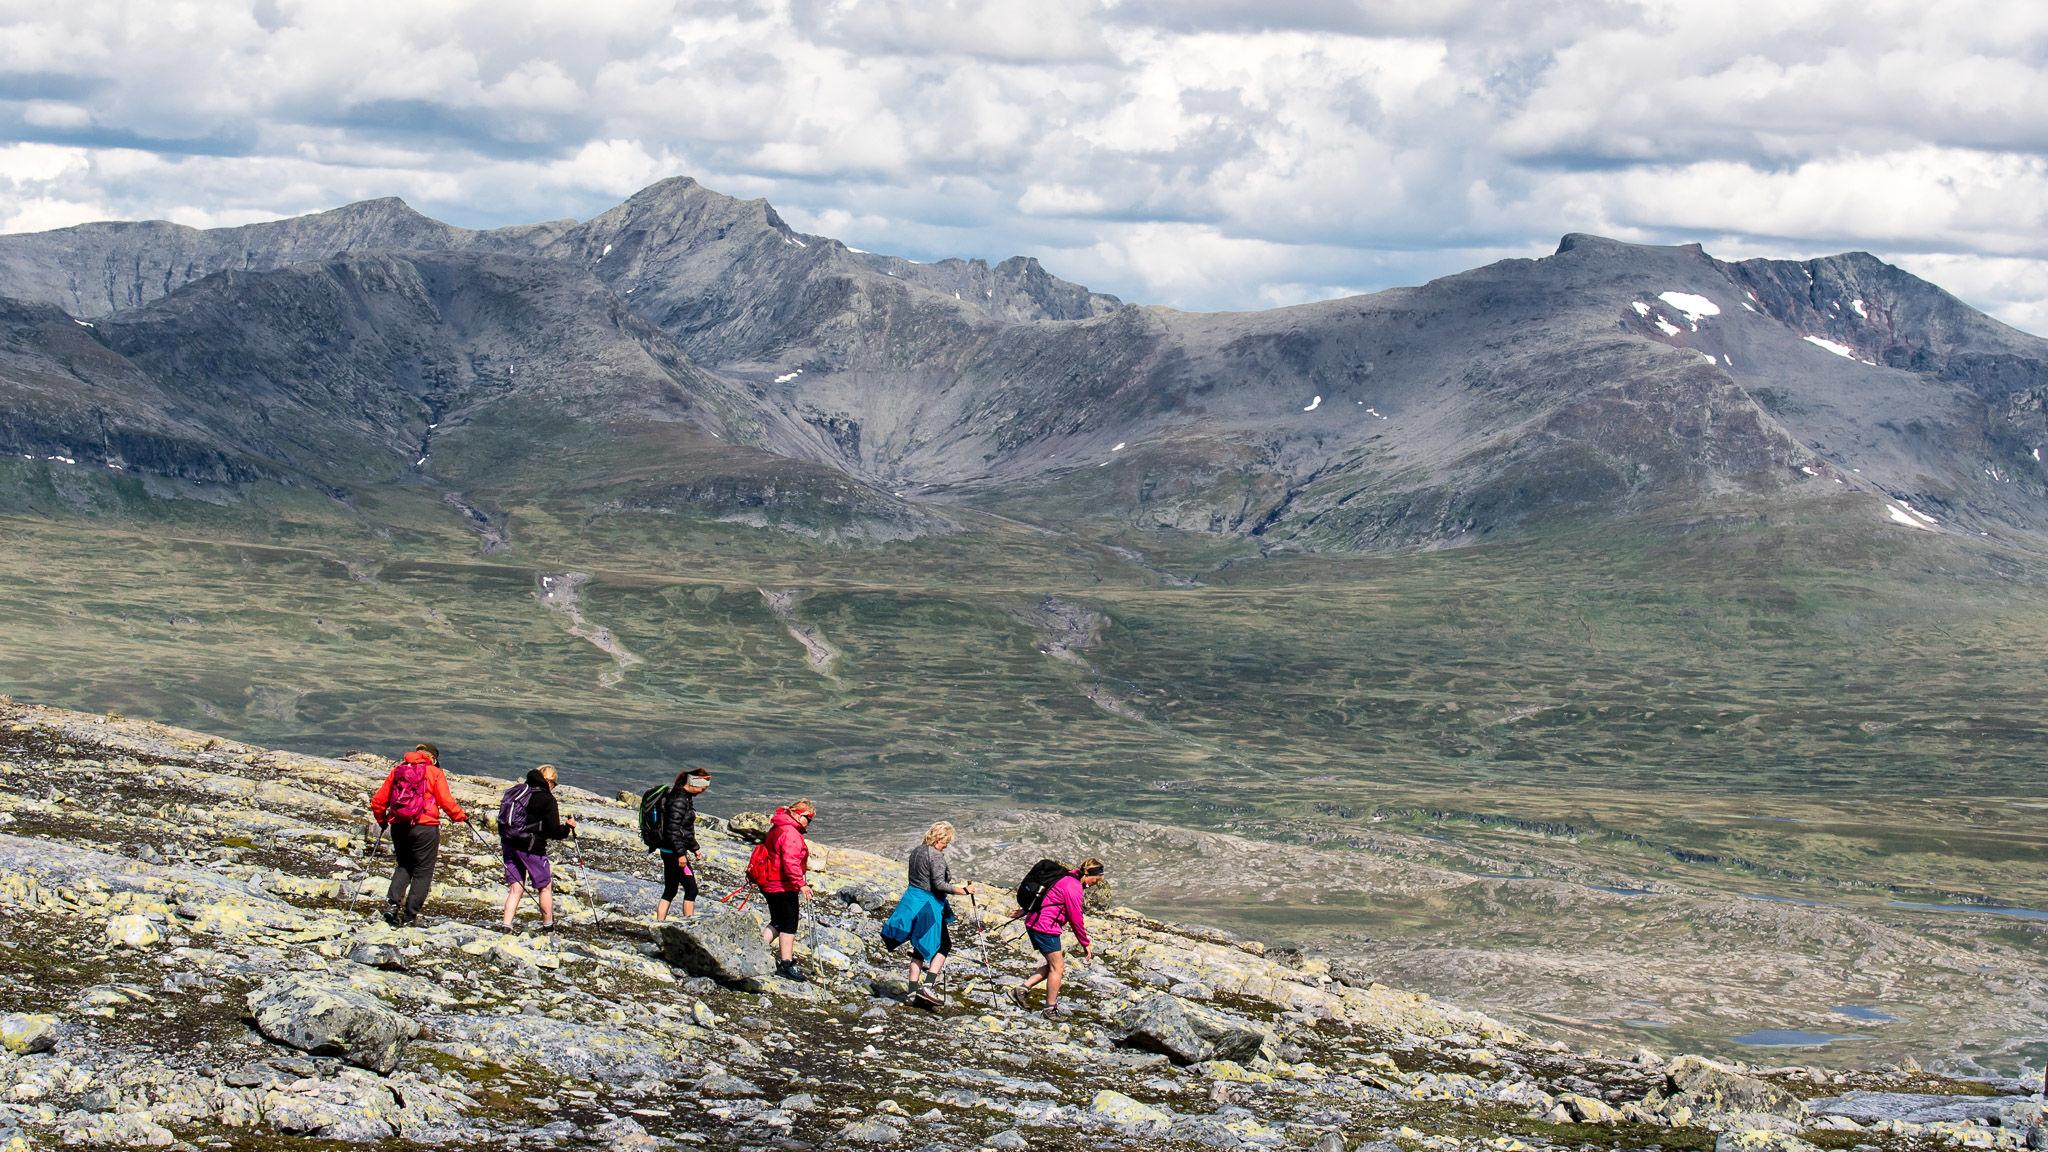 Ny i fjellet eller gammel traver? Denne turkatalogen har noe for en hver. Foto: Geir Horndalen